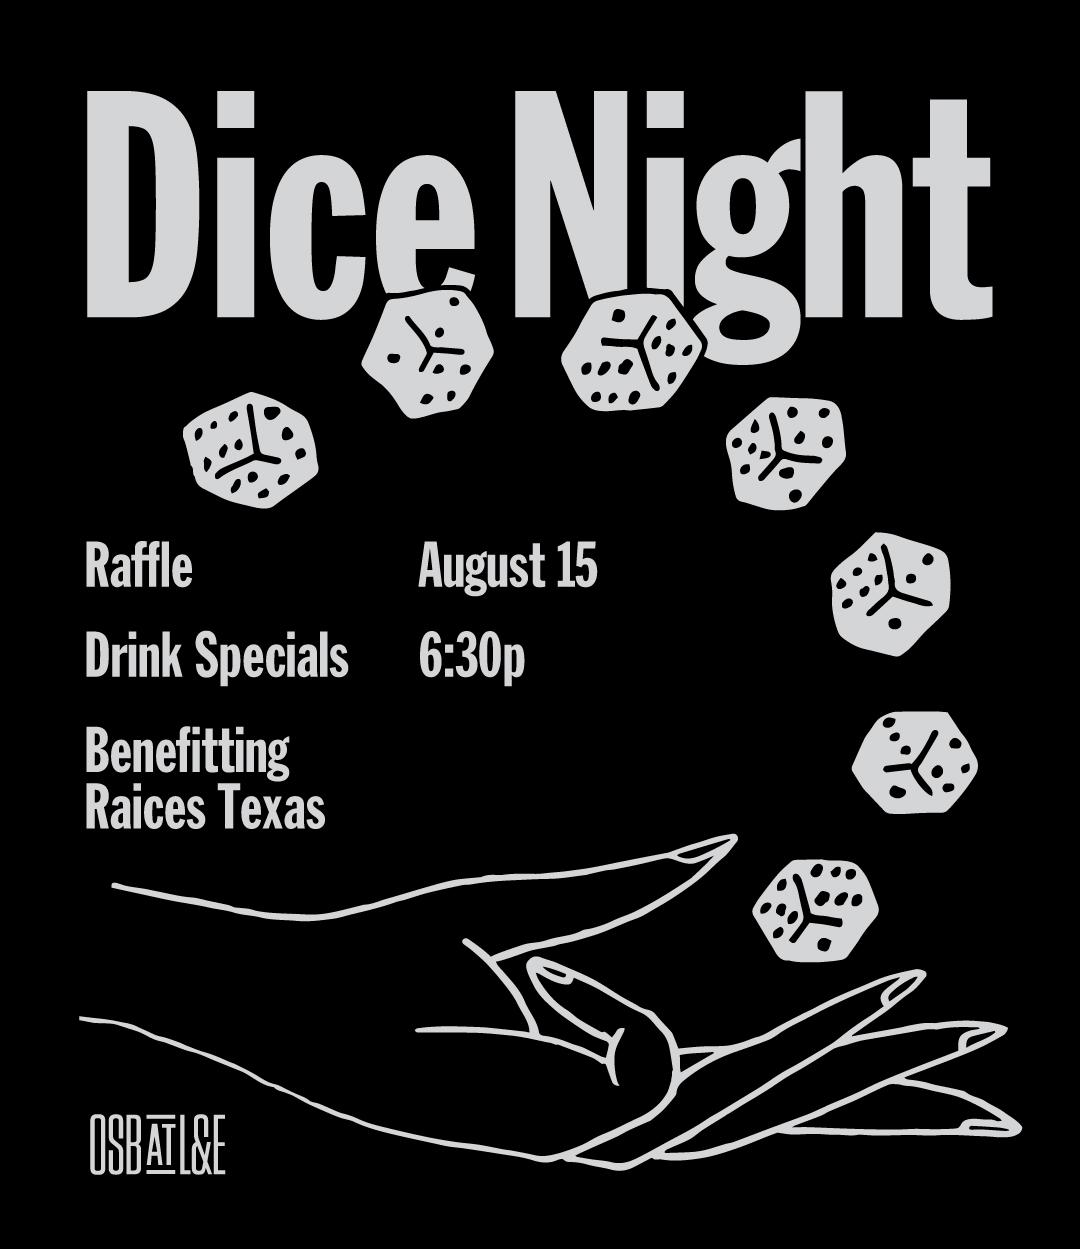 08-05-19-dice-night-instagram.jpg